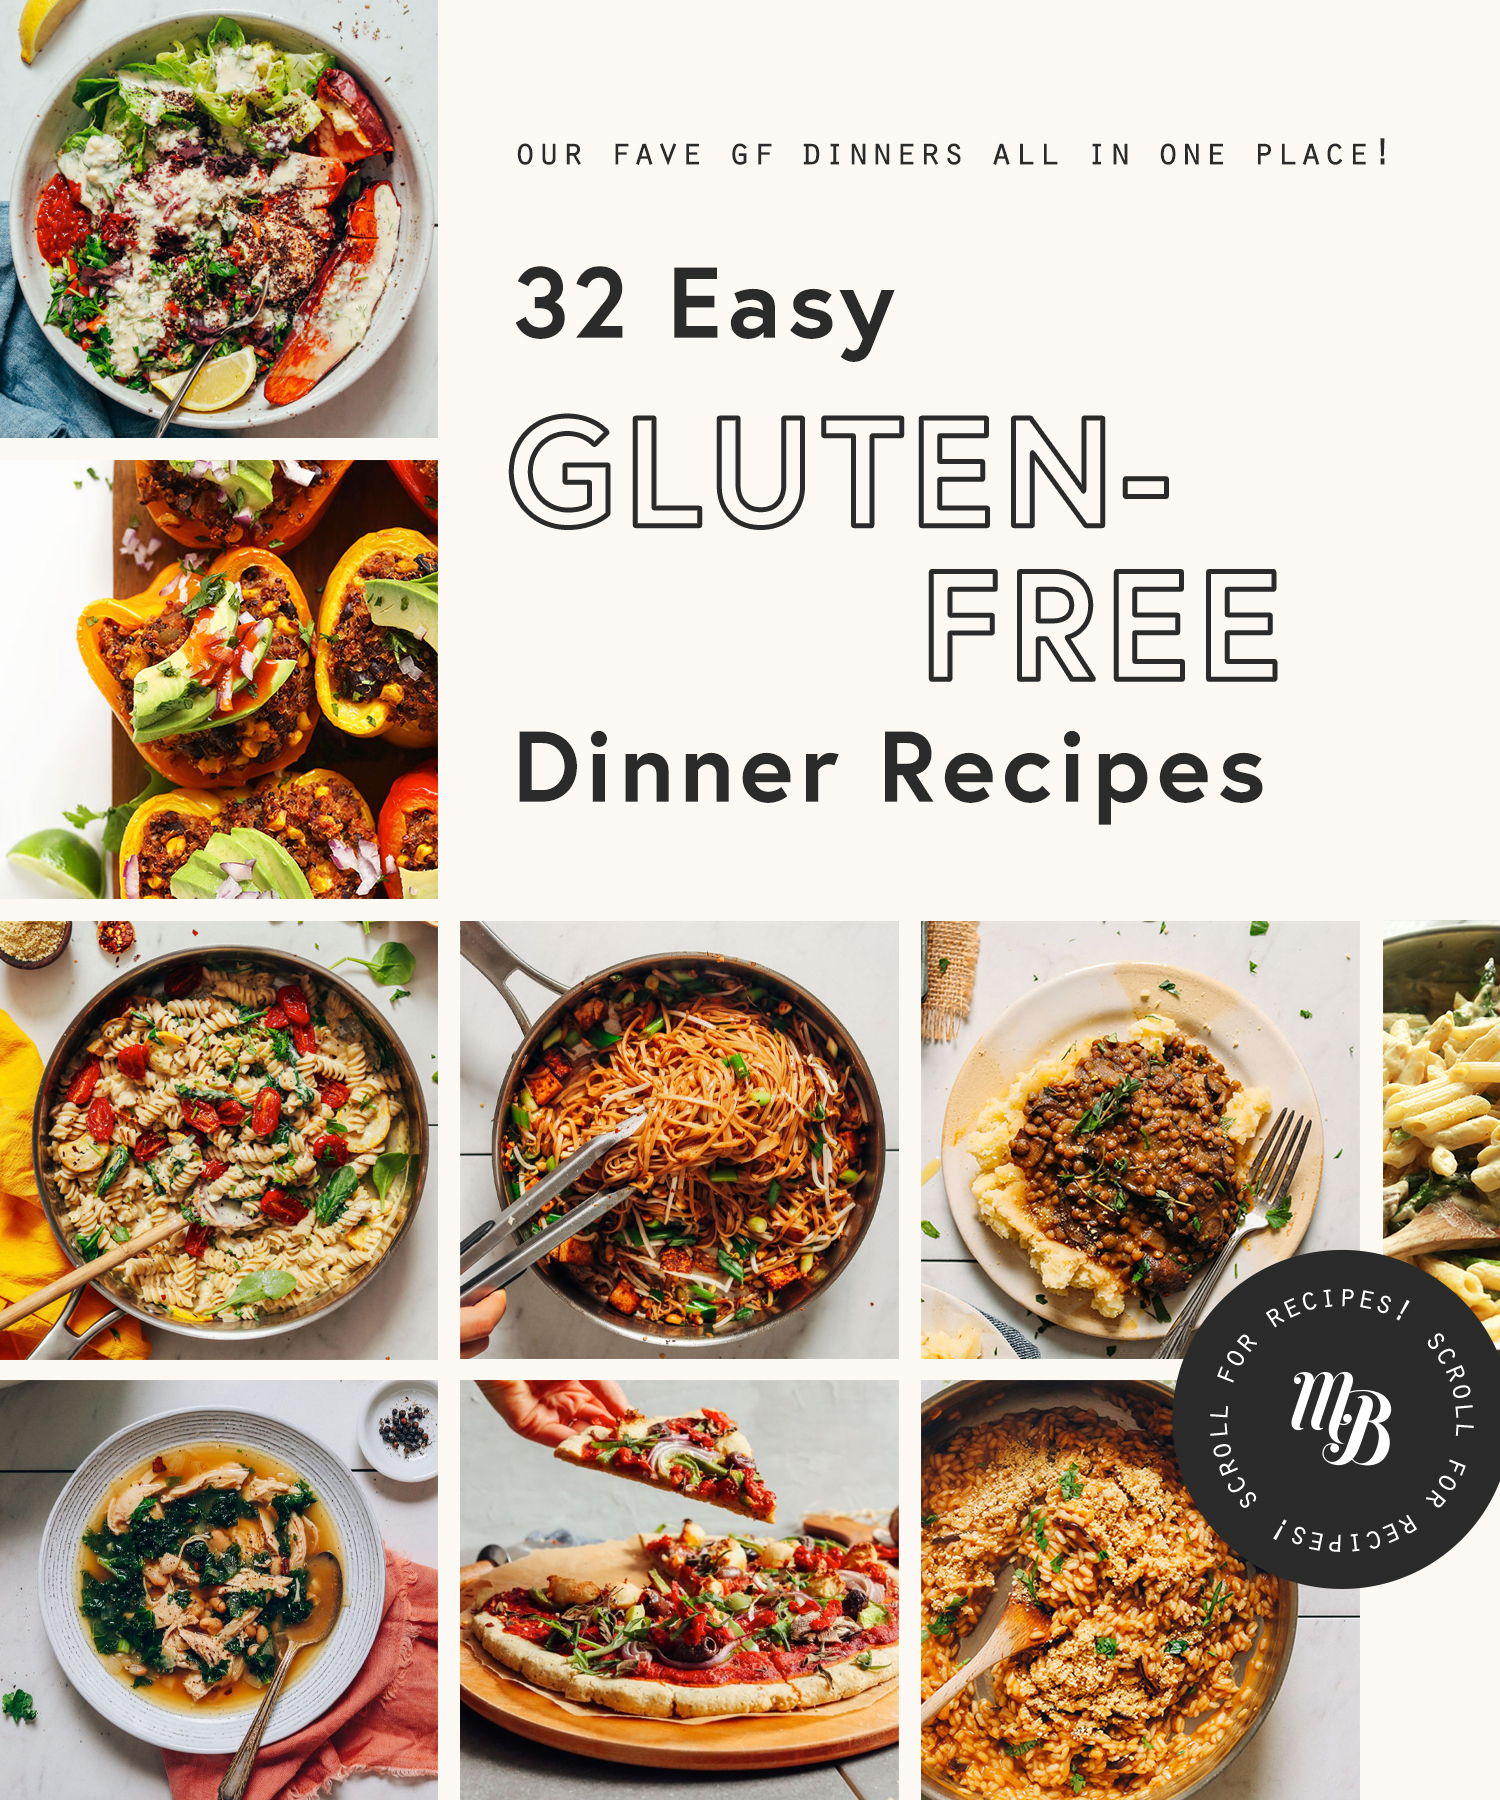 Photos of easy gluten-free dinner recipes